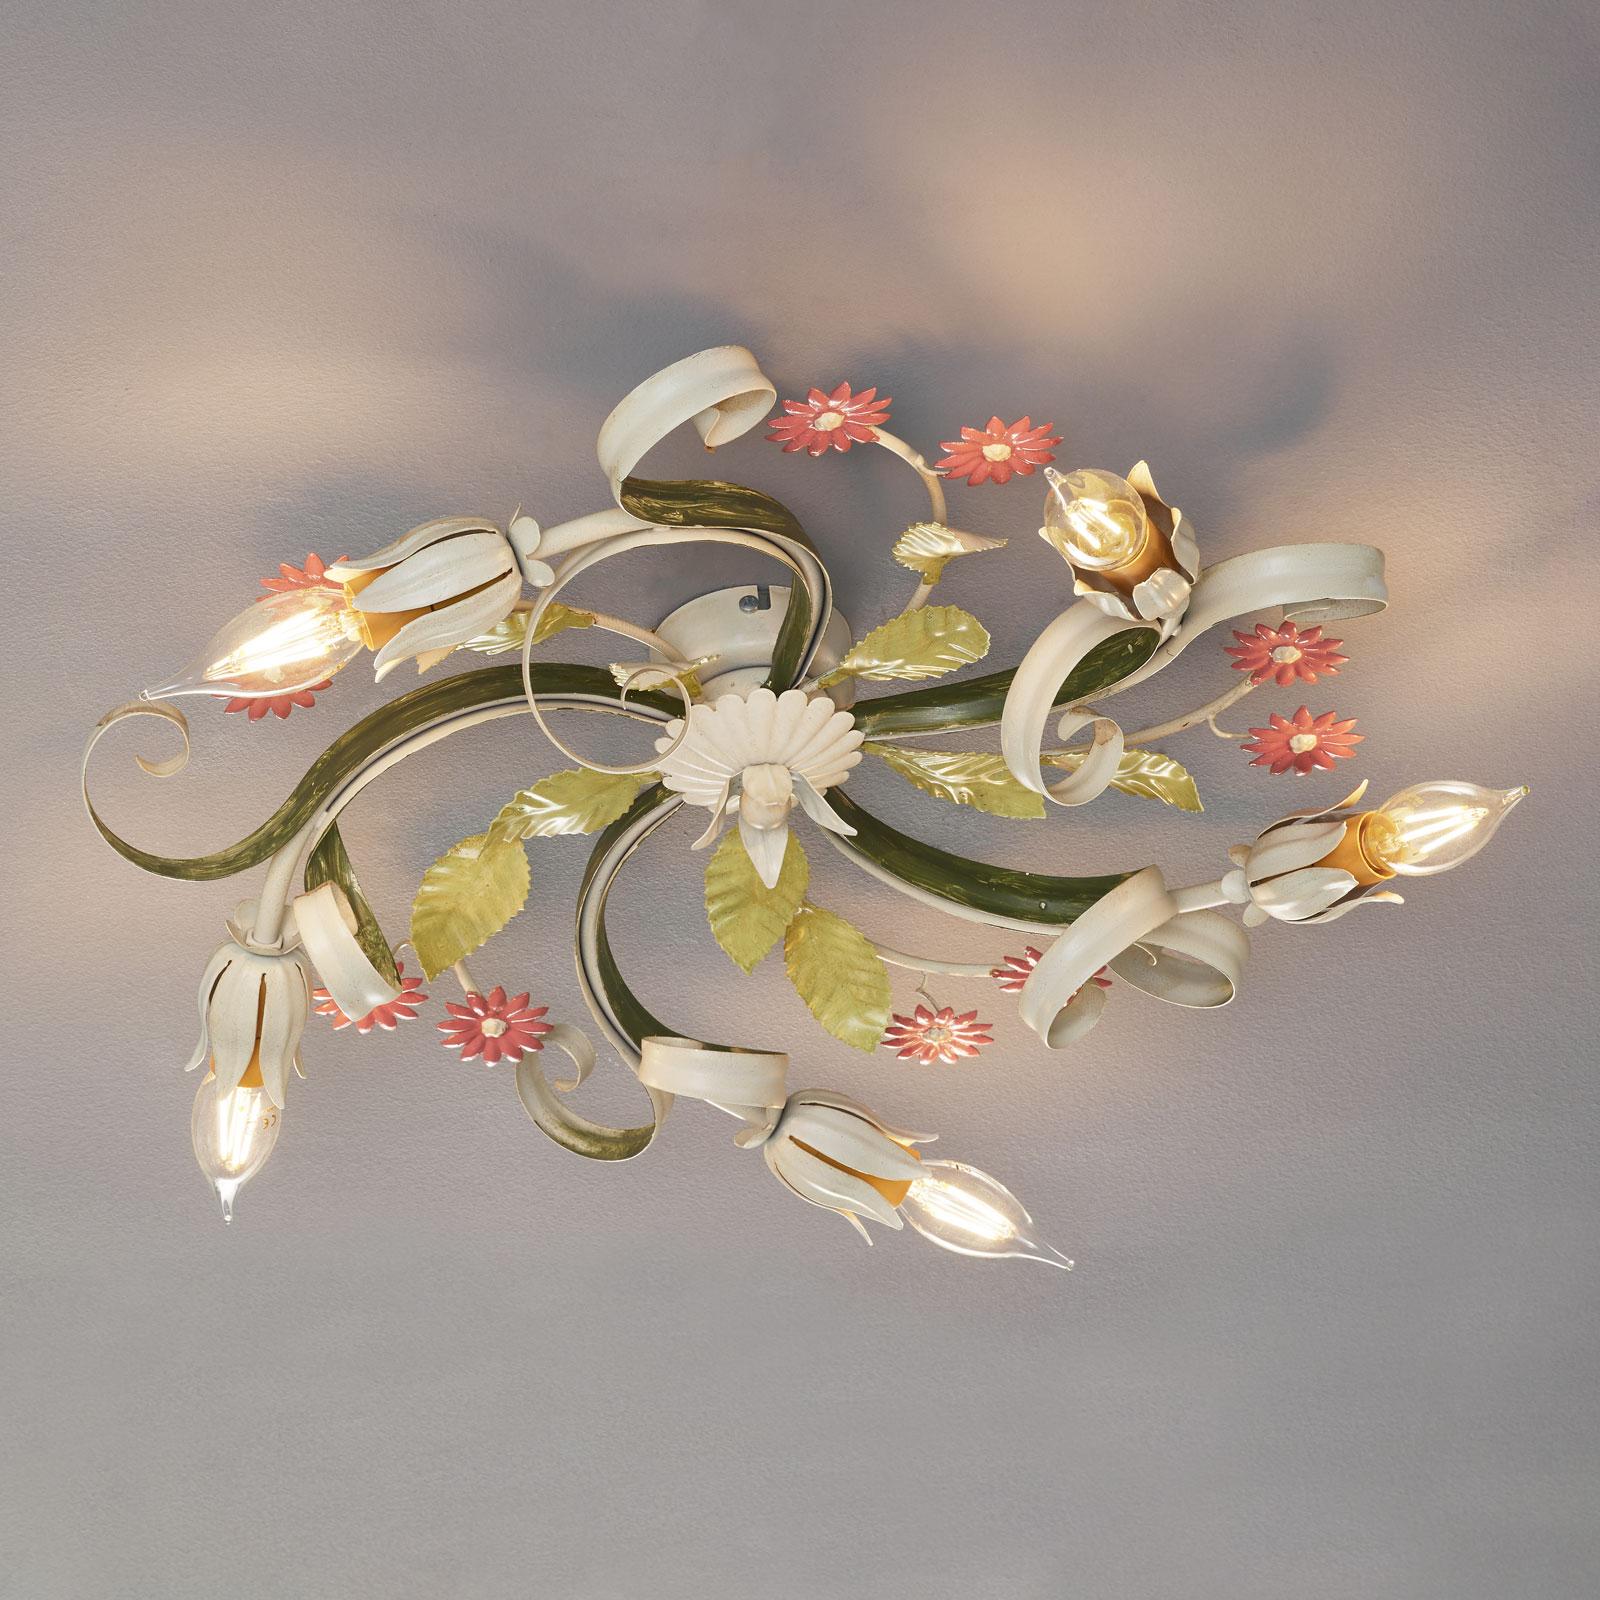 Florentijnse plafondlamp Toscane, 5 lampjes